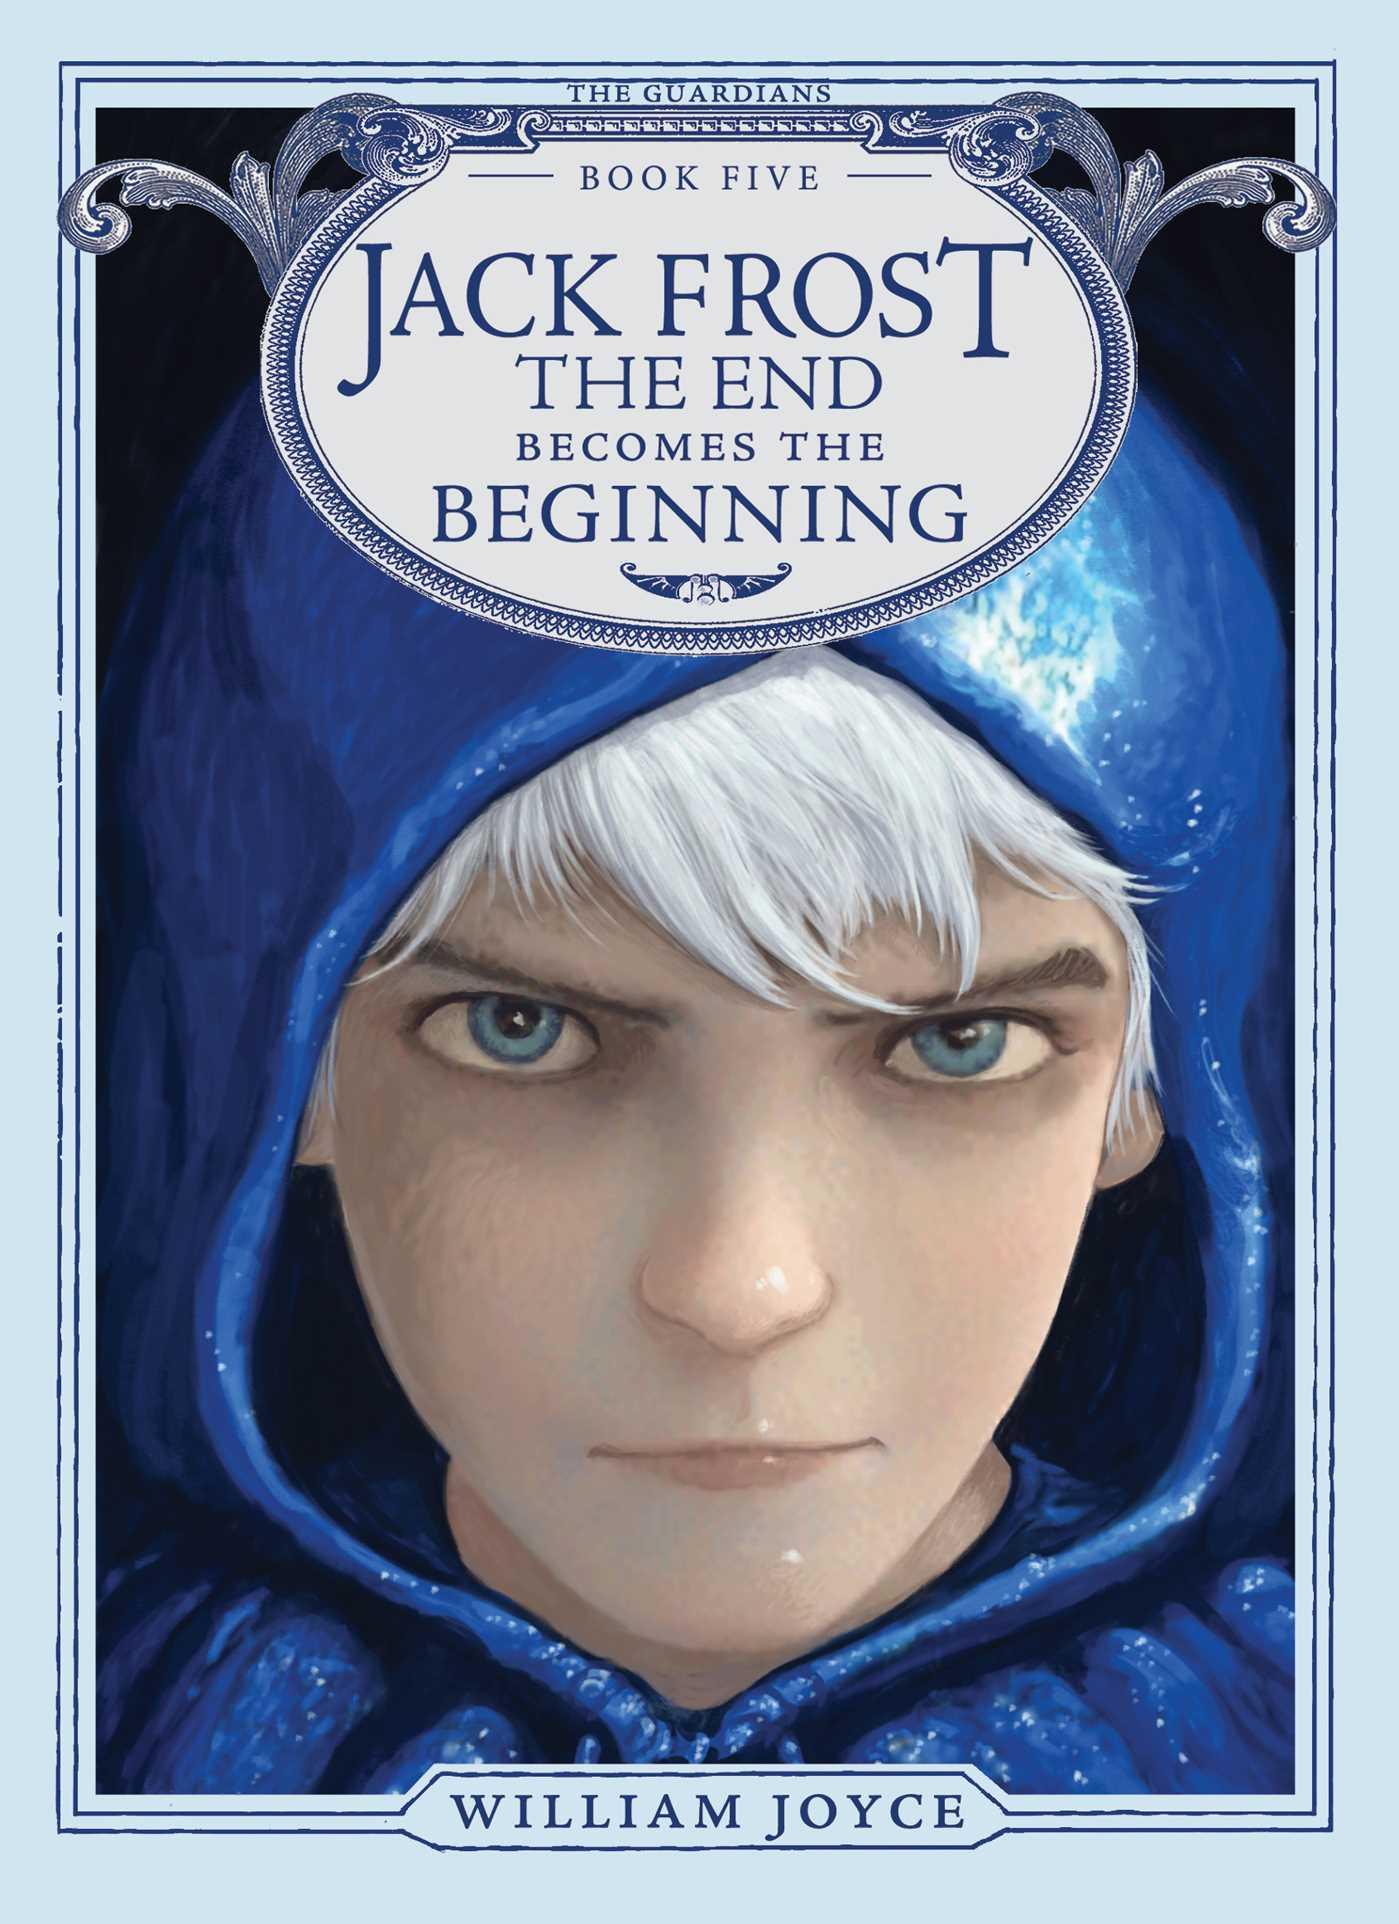 Jack frost 9781442430563 hr